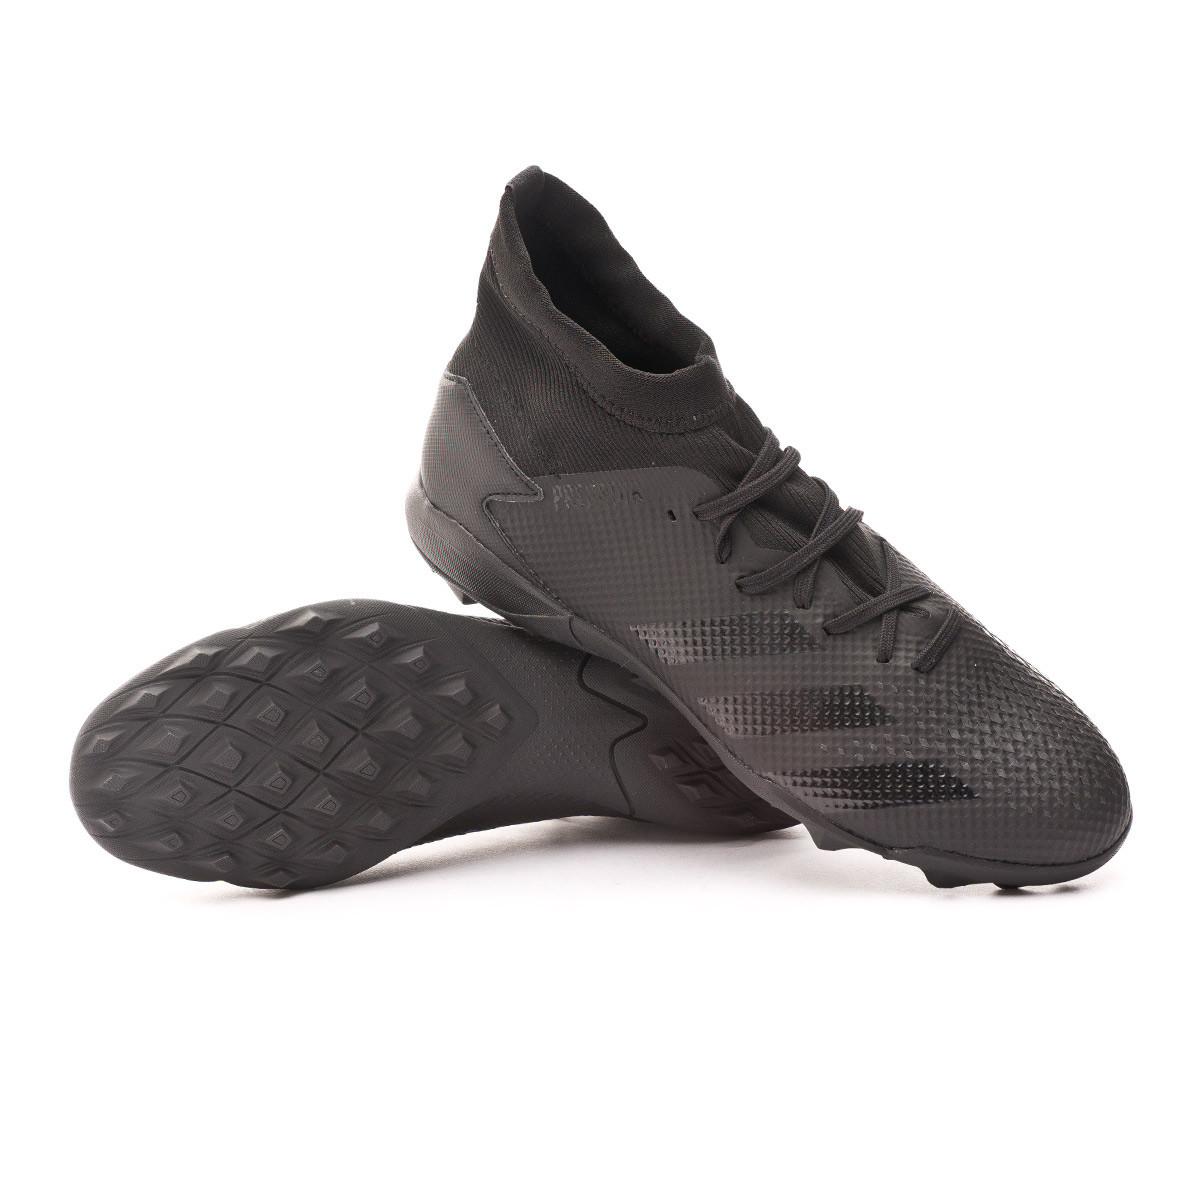 adidas Predator 20.3 Turf Football Boot